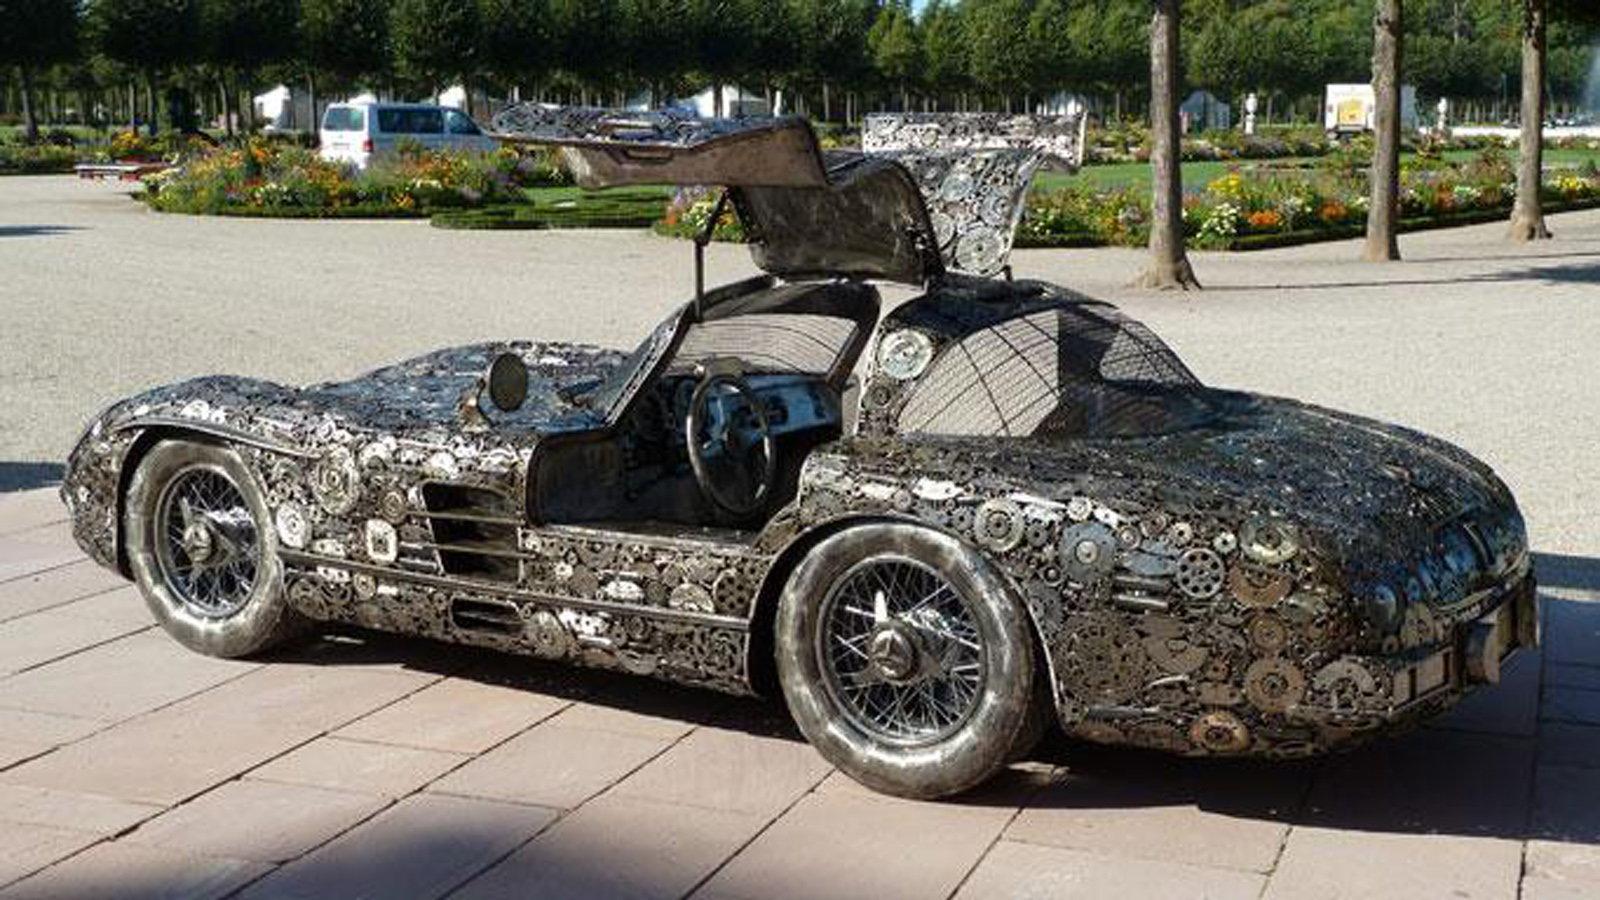 The Mercedes 300 SLR Scrap Metal Replica